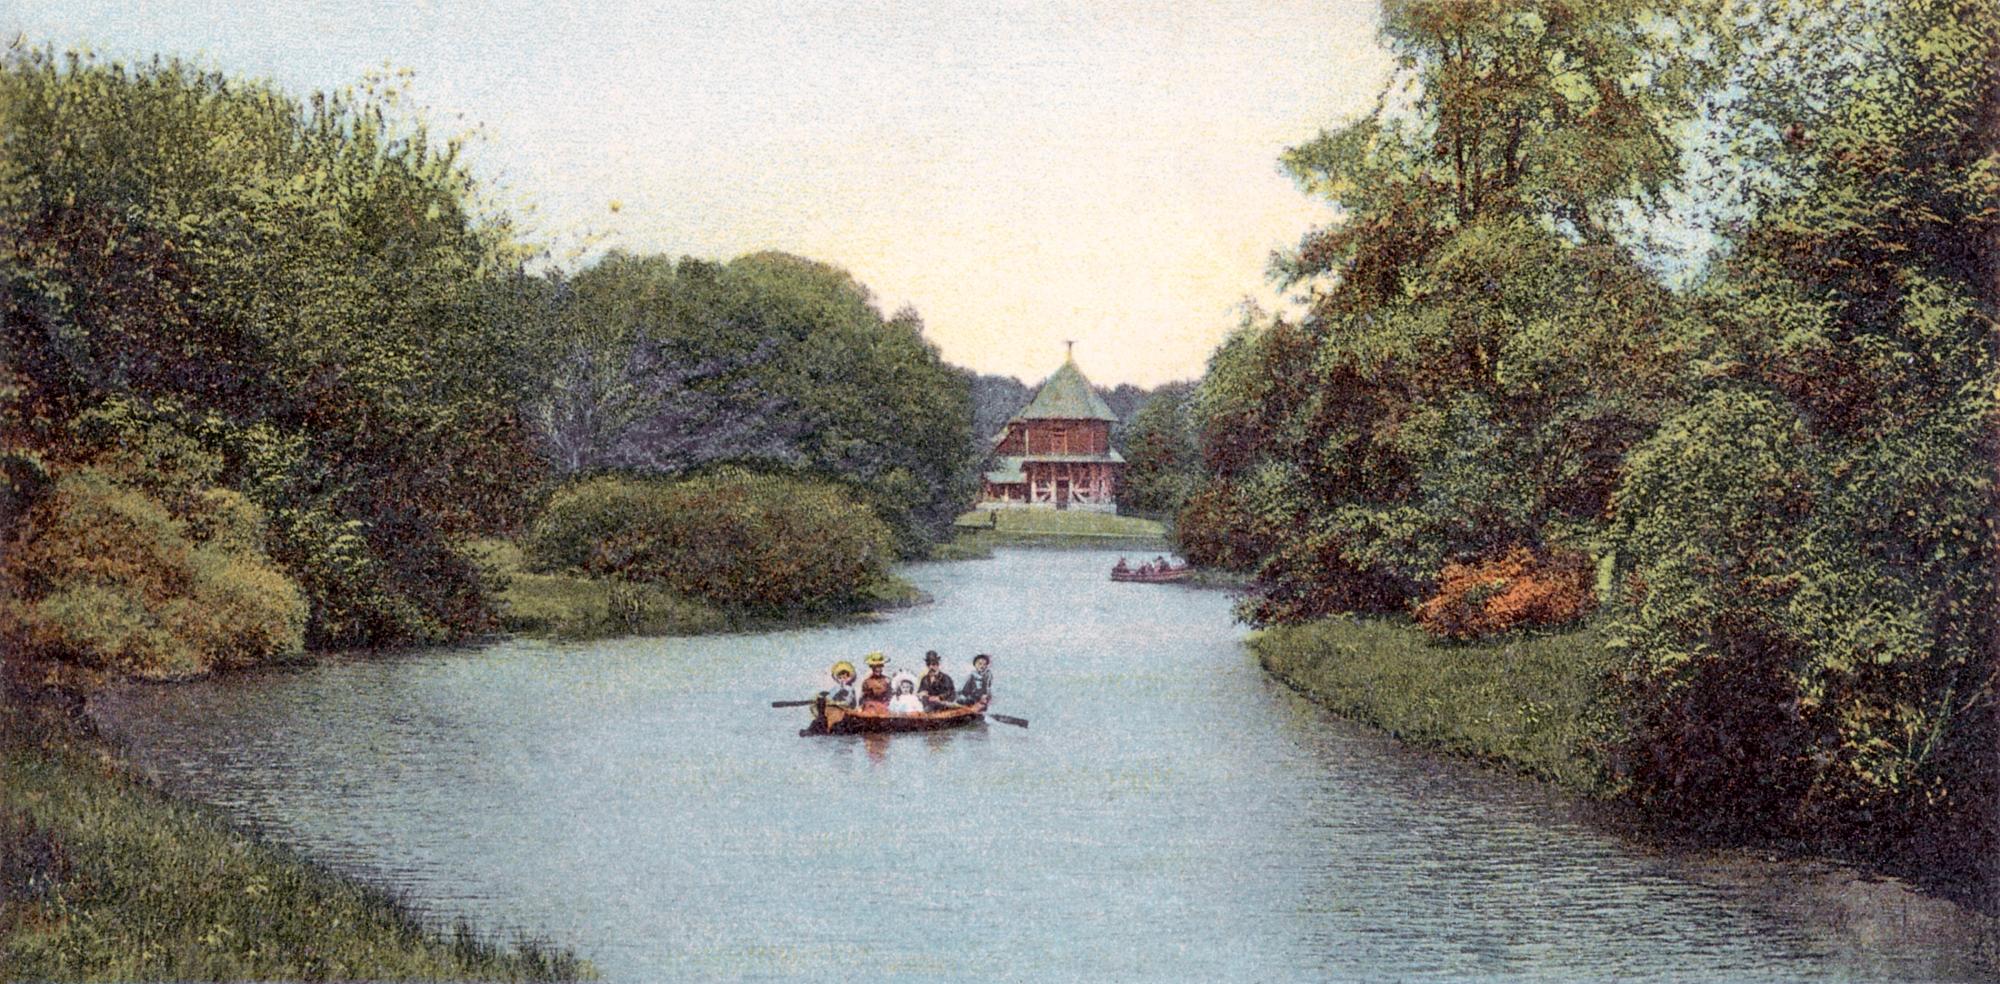 Nr.696 - Blick uebers Wasser zum Wildgehege, Ruderboot